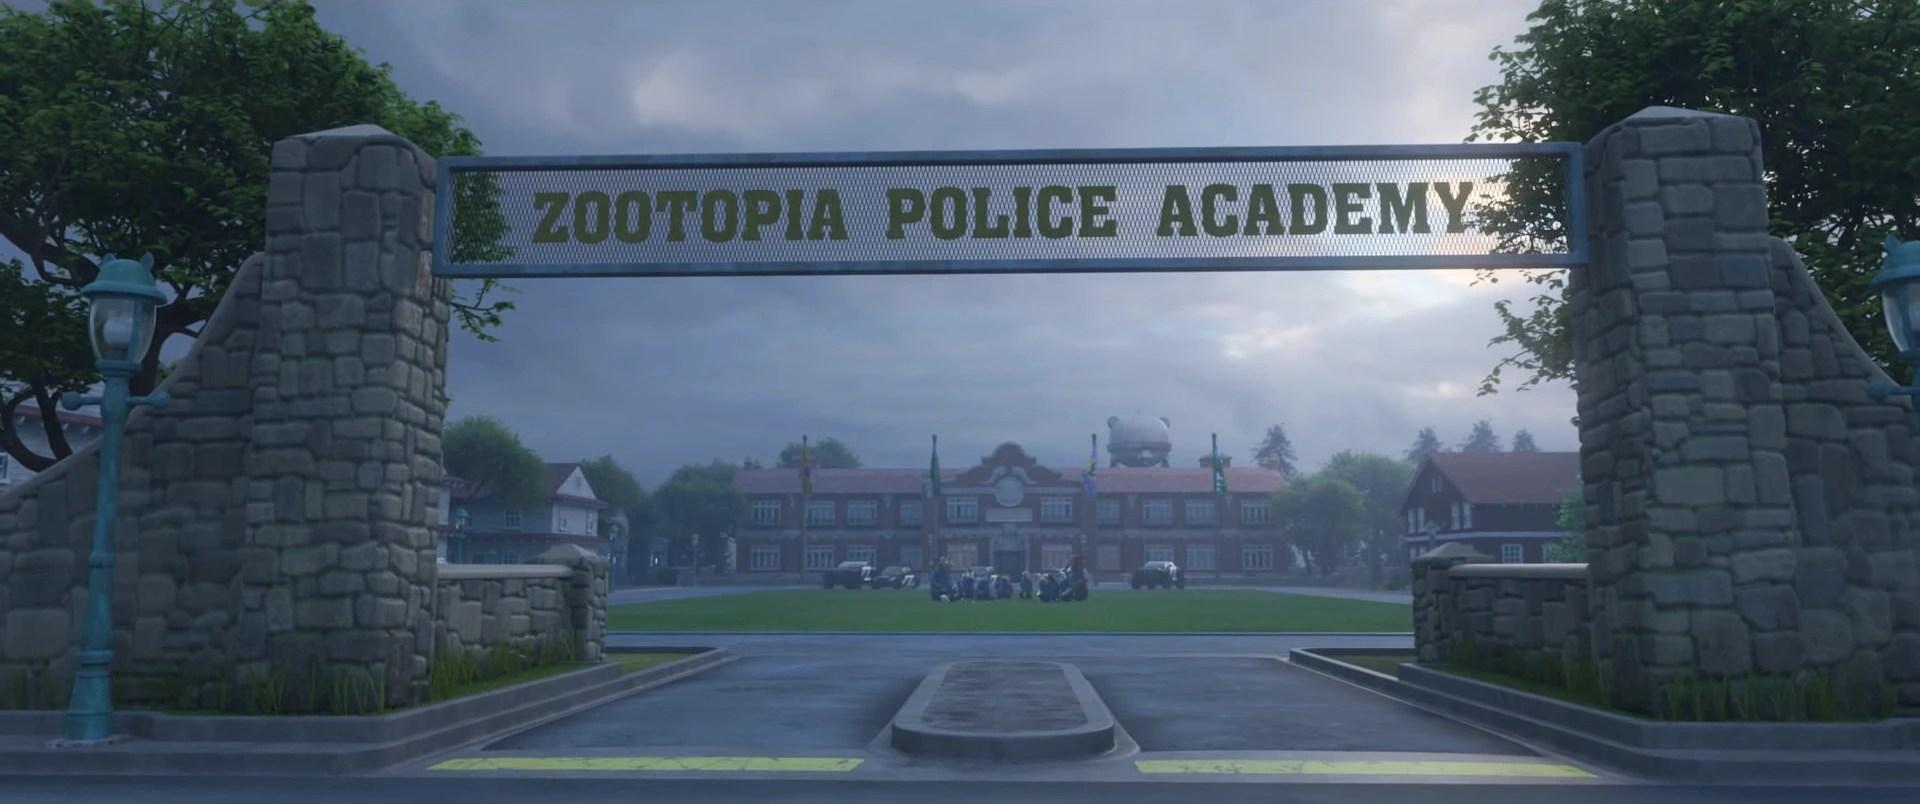 Police Cop Car Live Wallpaper Zootopia Police Academy Disney Wiki Fandom Powered By